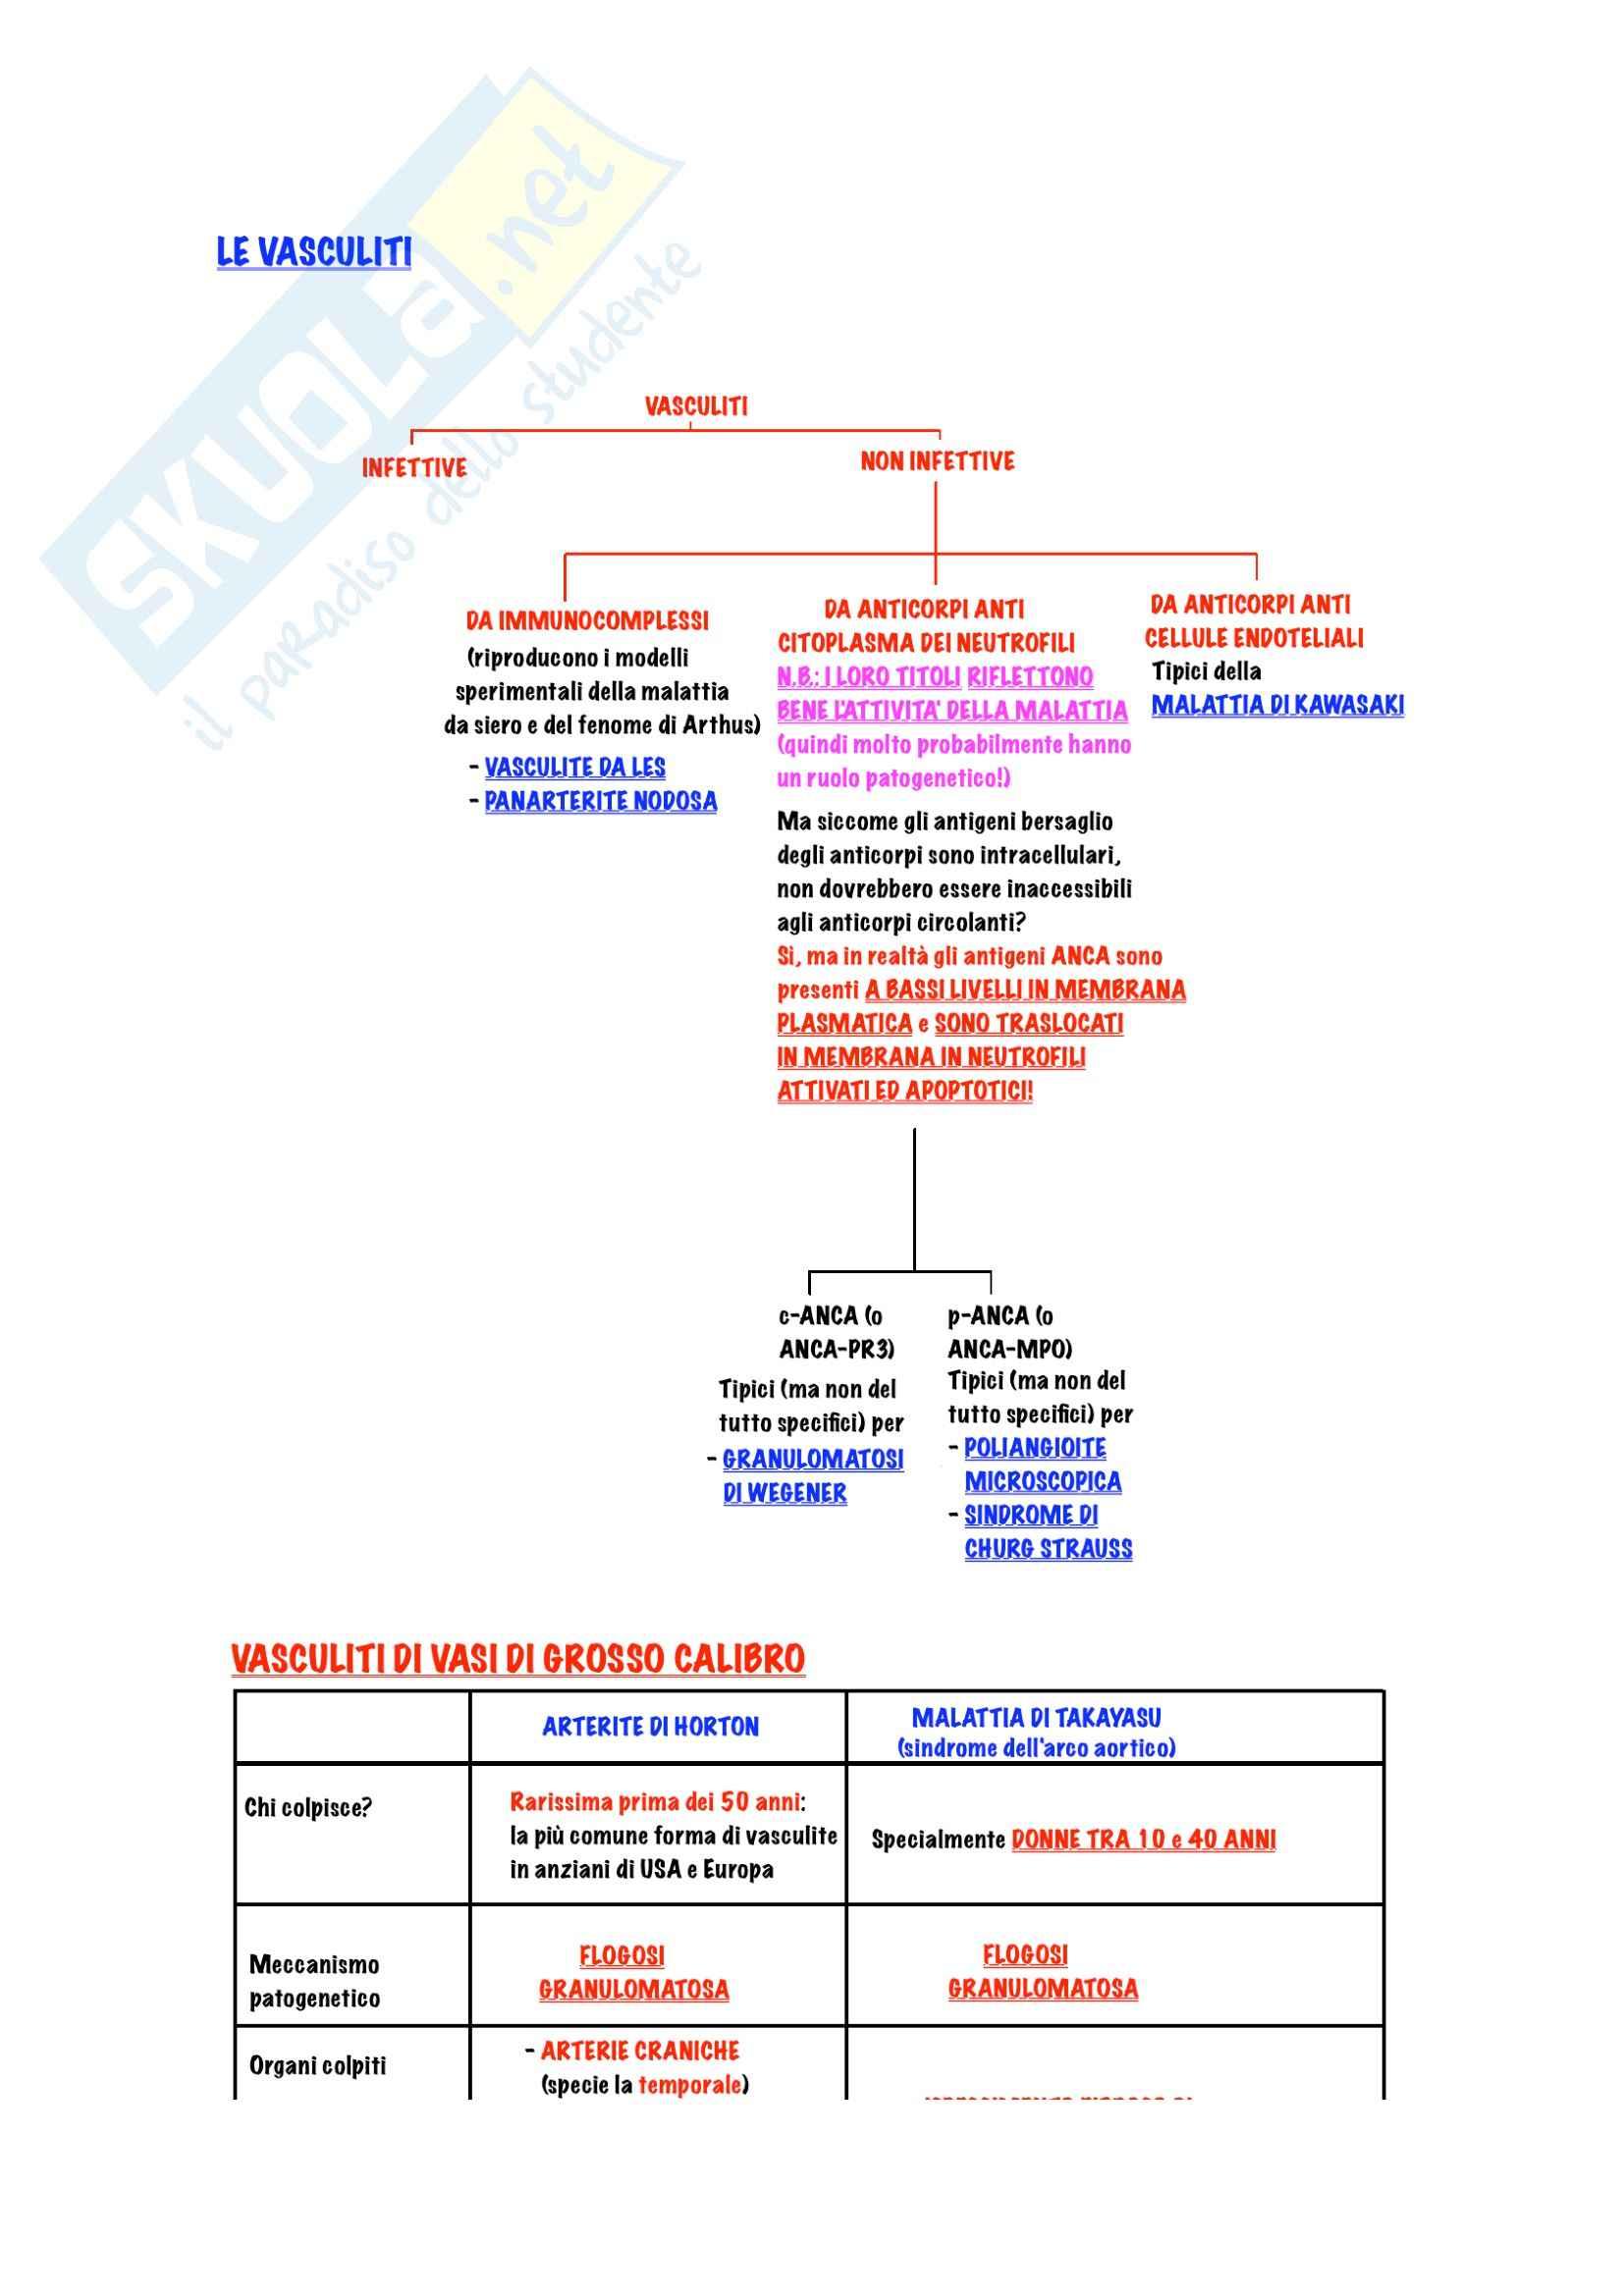 Reumatologia - Vasculiti